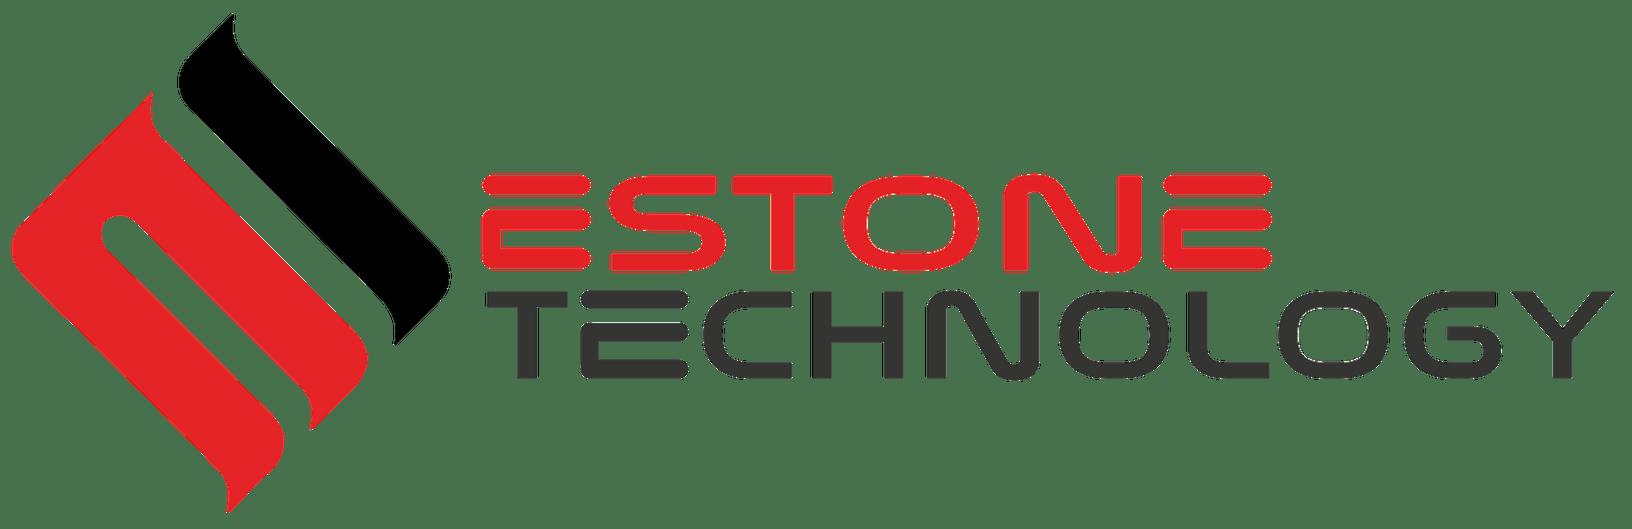 Estone Technology